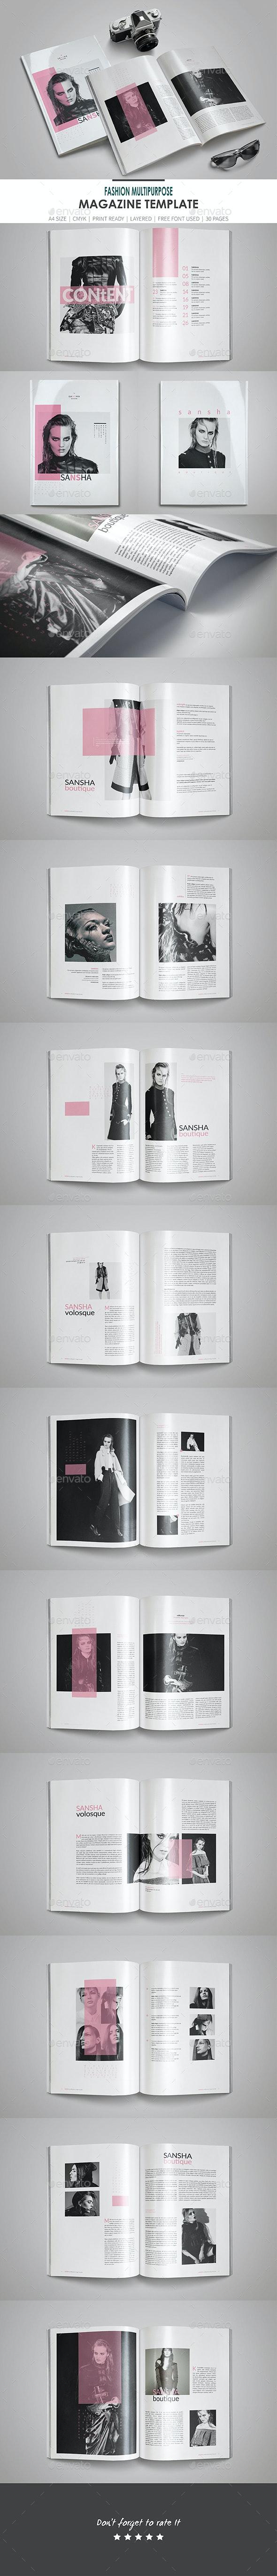 Fashion Multipurpose Magazine Template - Magazines Print Templates